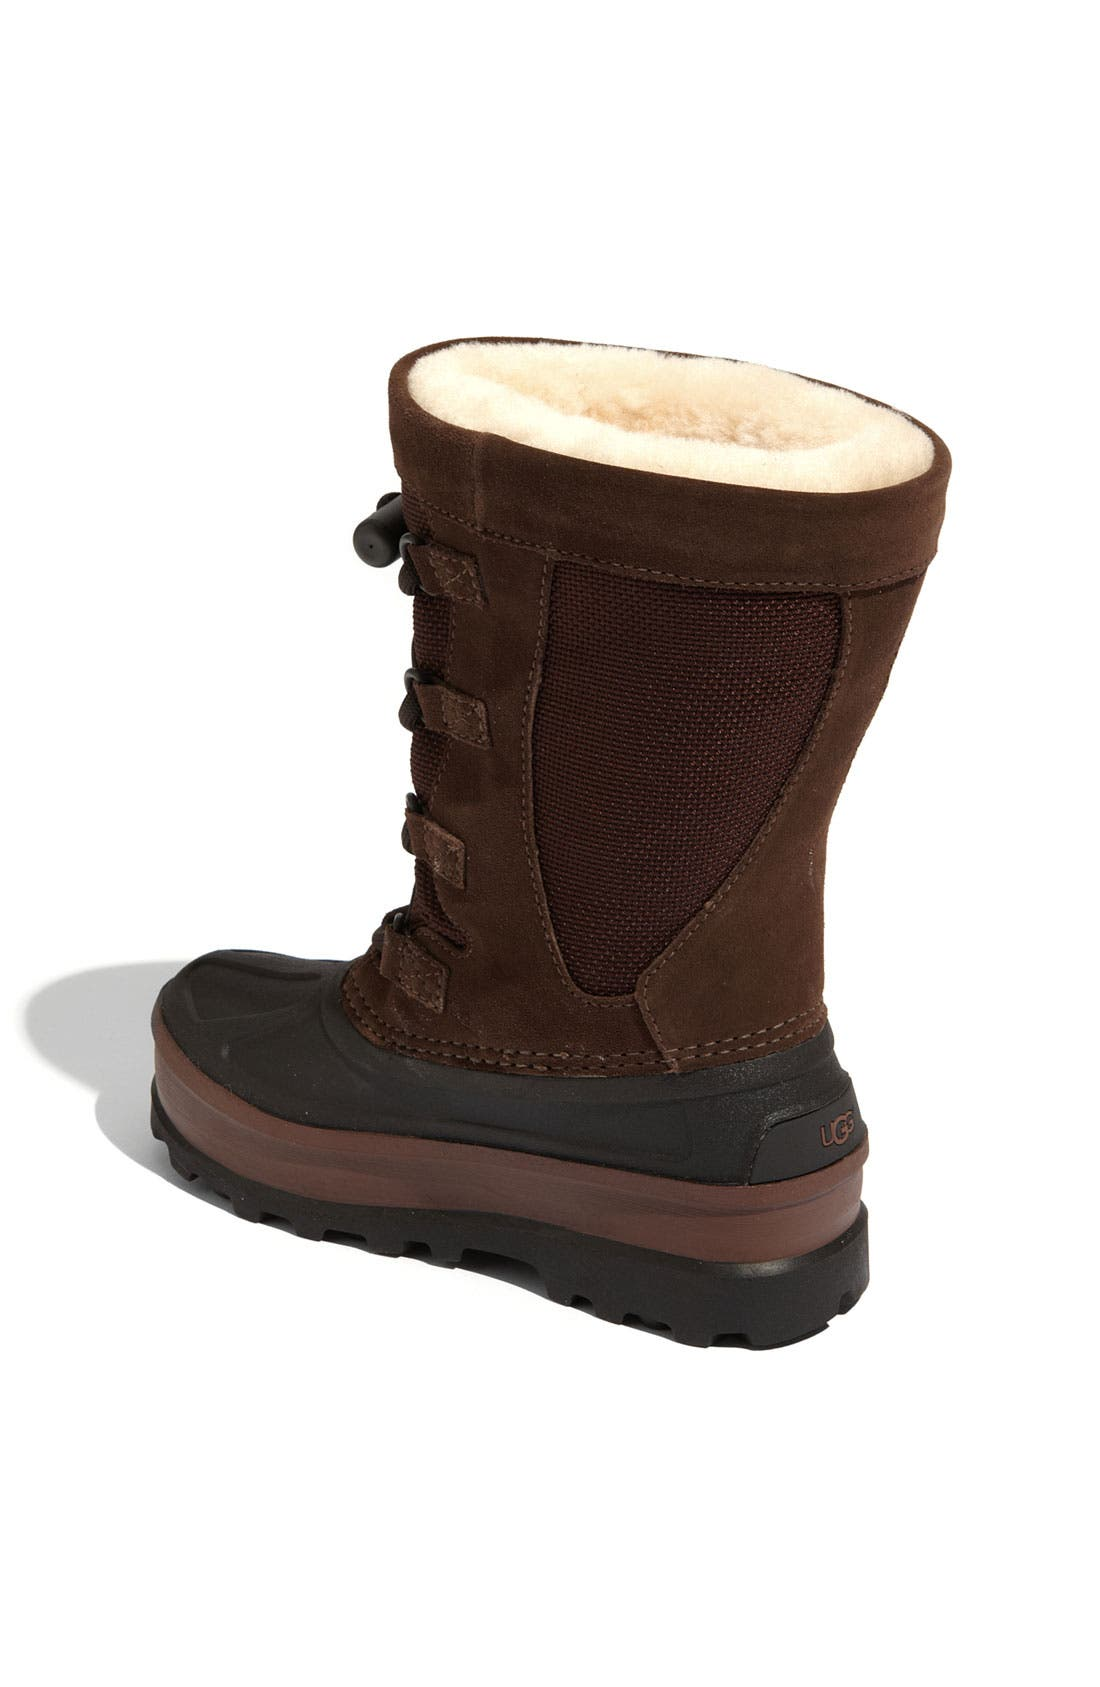 Alternate Image 2  - UGG® Australia 'Bobbey' Boot (Little Kid & Big Kid)